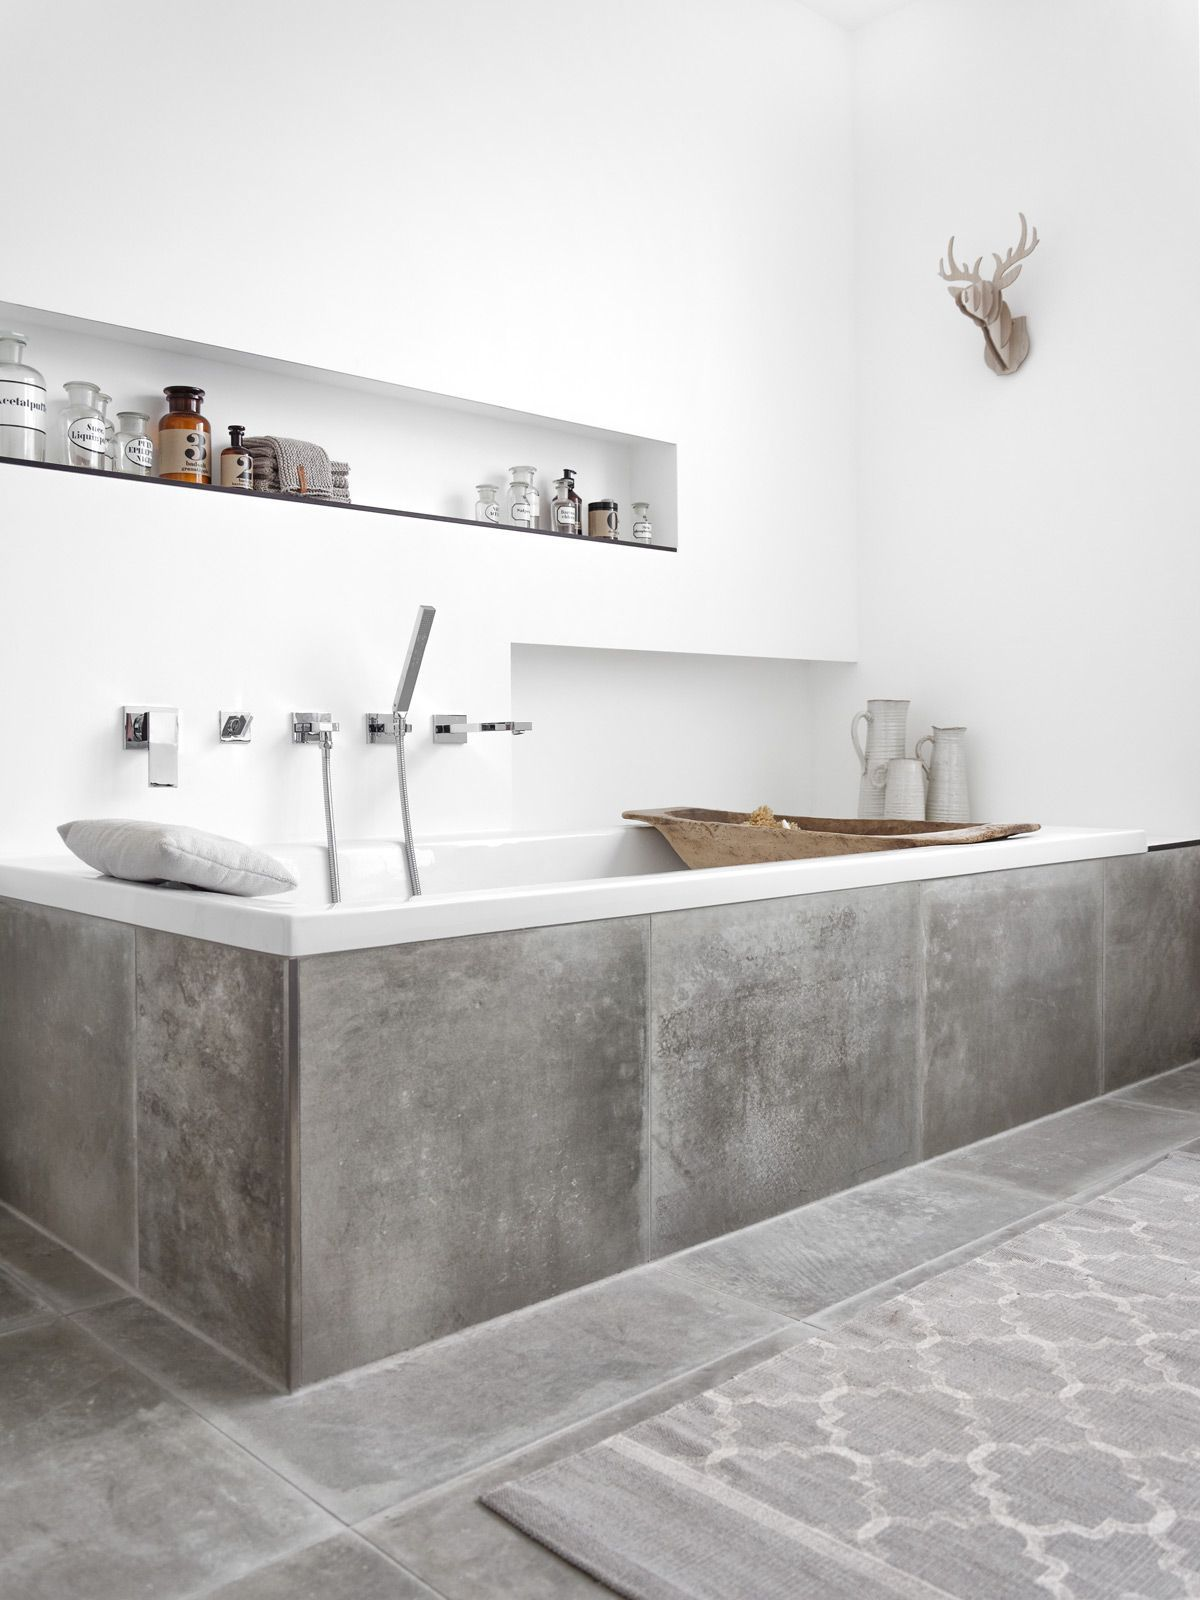 DEKORATION | Salle de bain design, Design moderne de salles ...